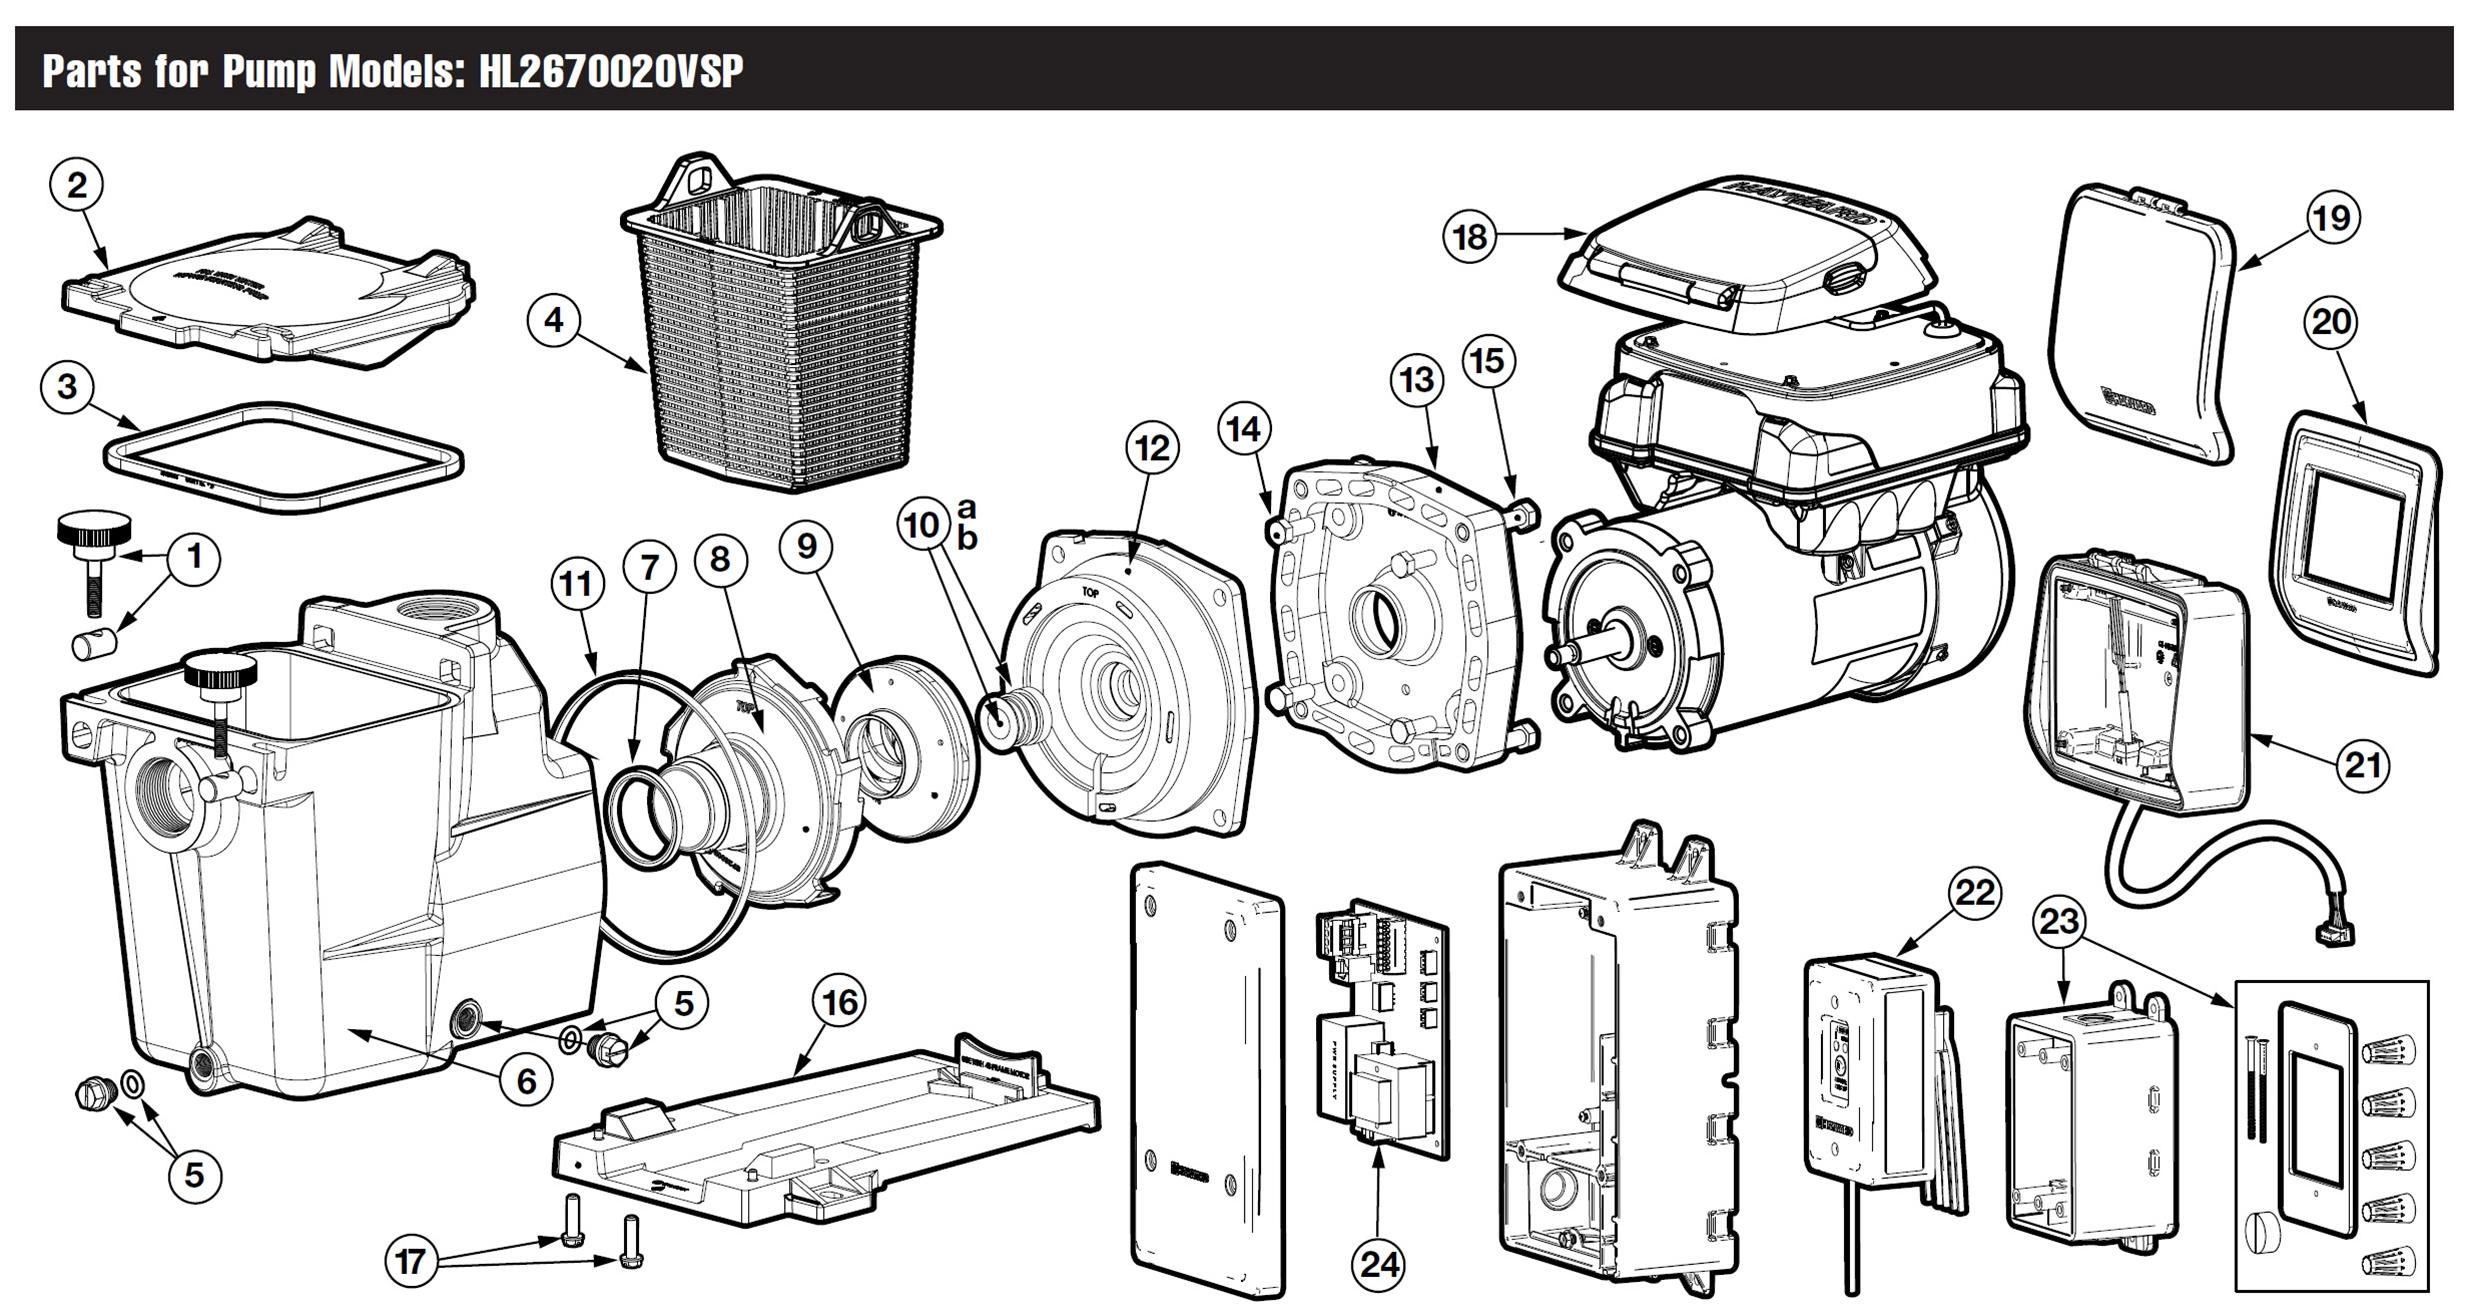 sp1600x pump series max images diagram writing sample ideas and guide VSB200 Remote vizio vsb200 user manual